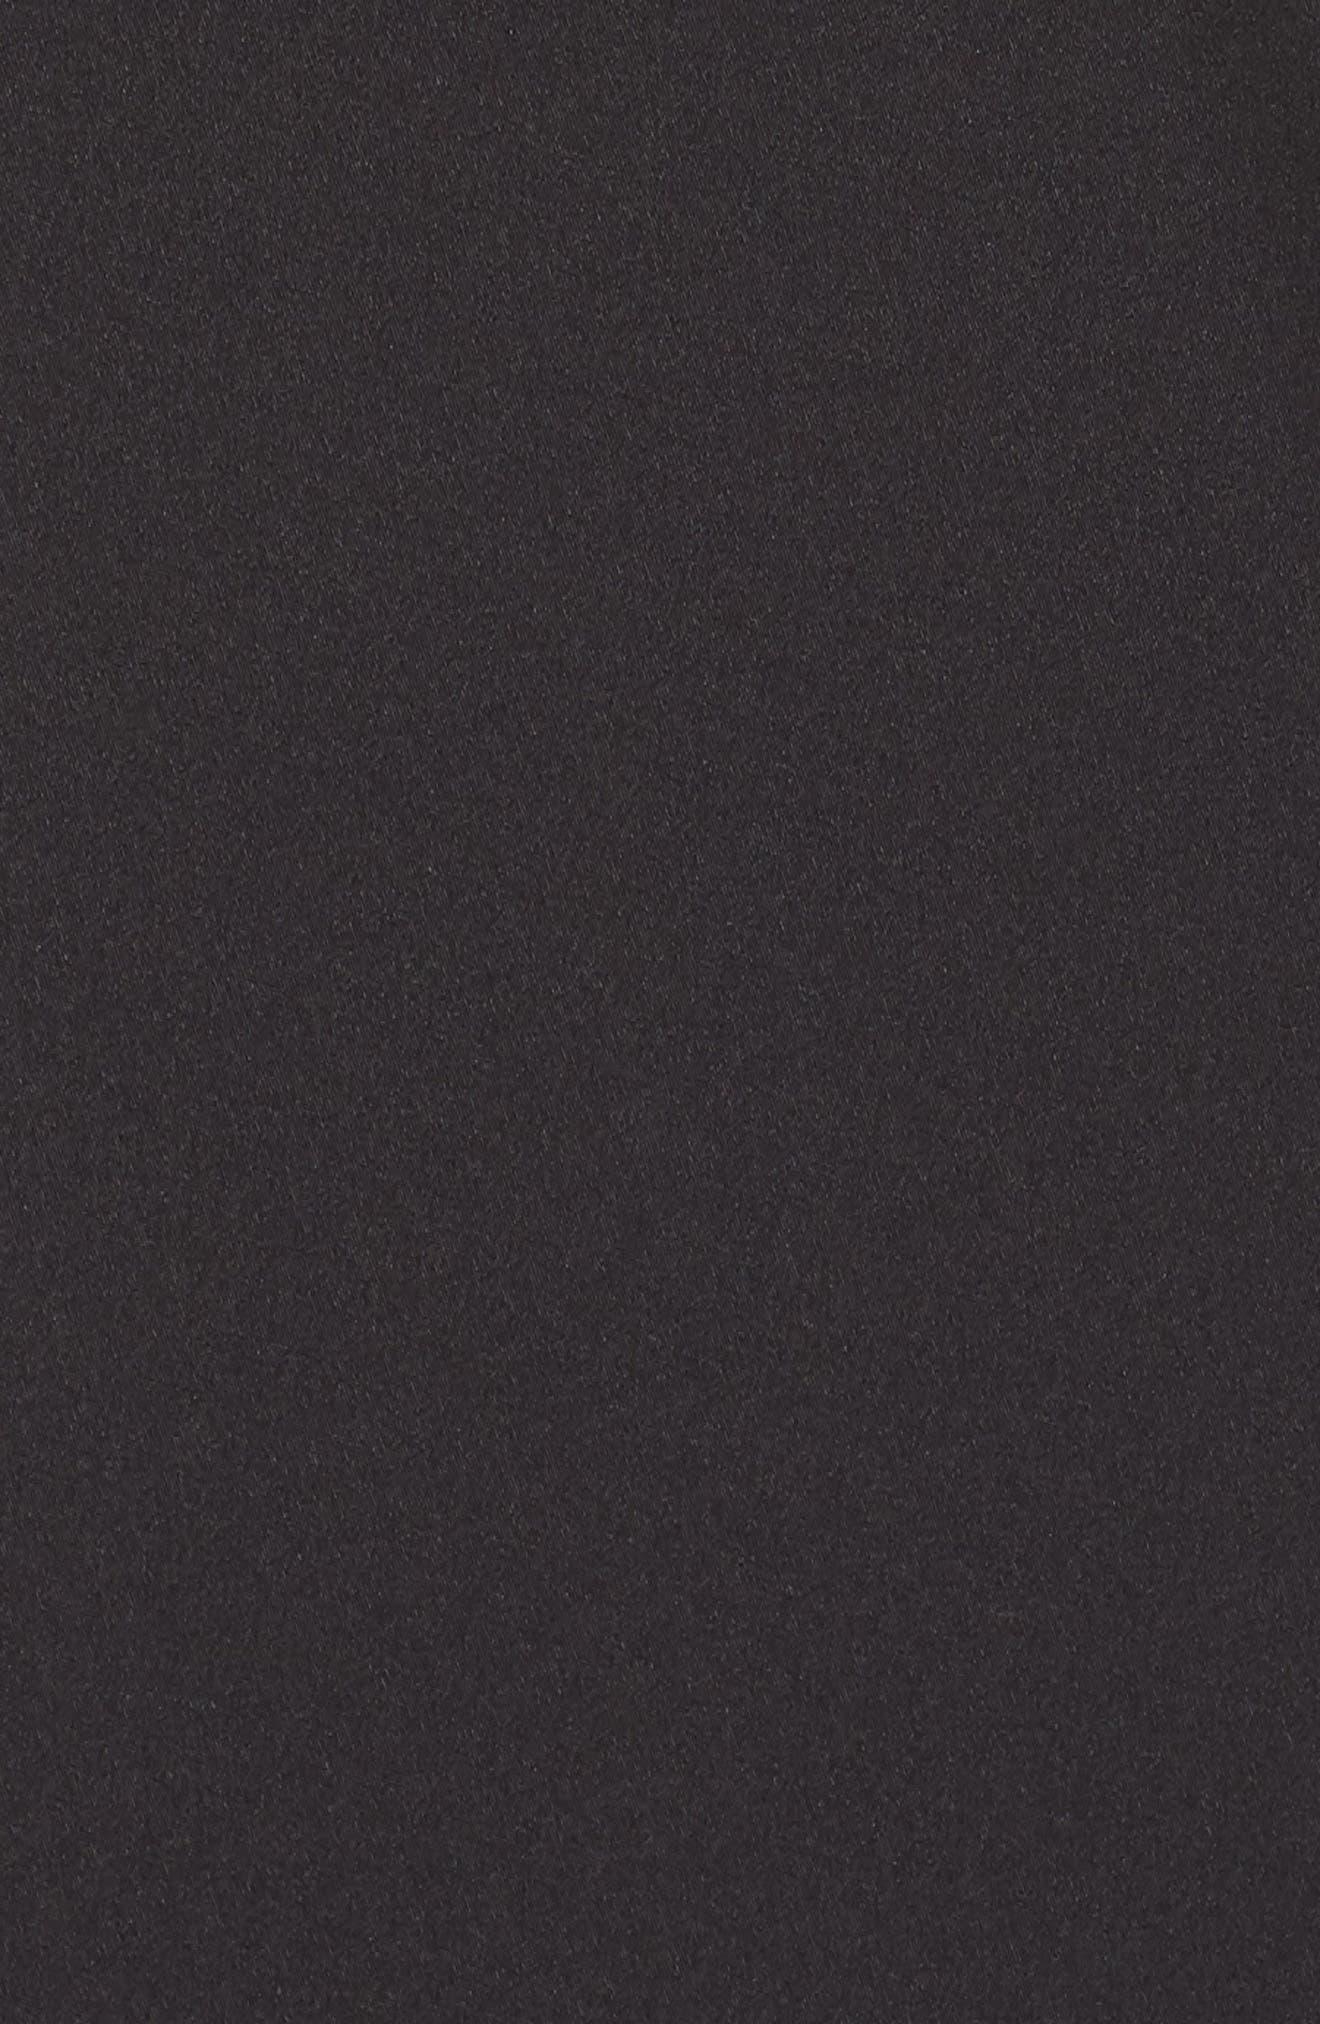 One-Shoulder Gown,                             Alternate thumbnail 5, color,                             Black